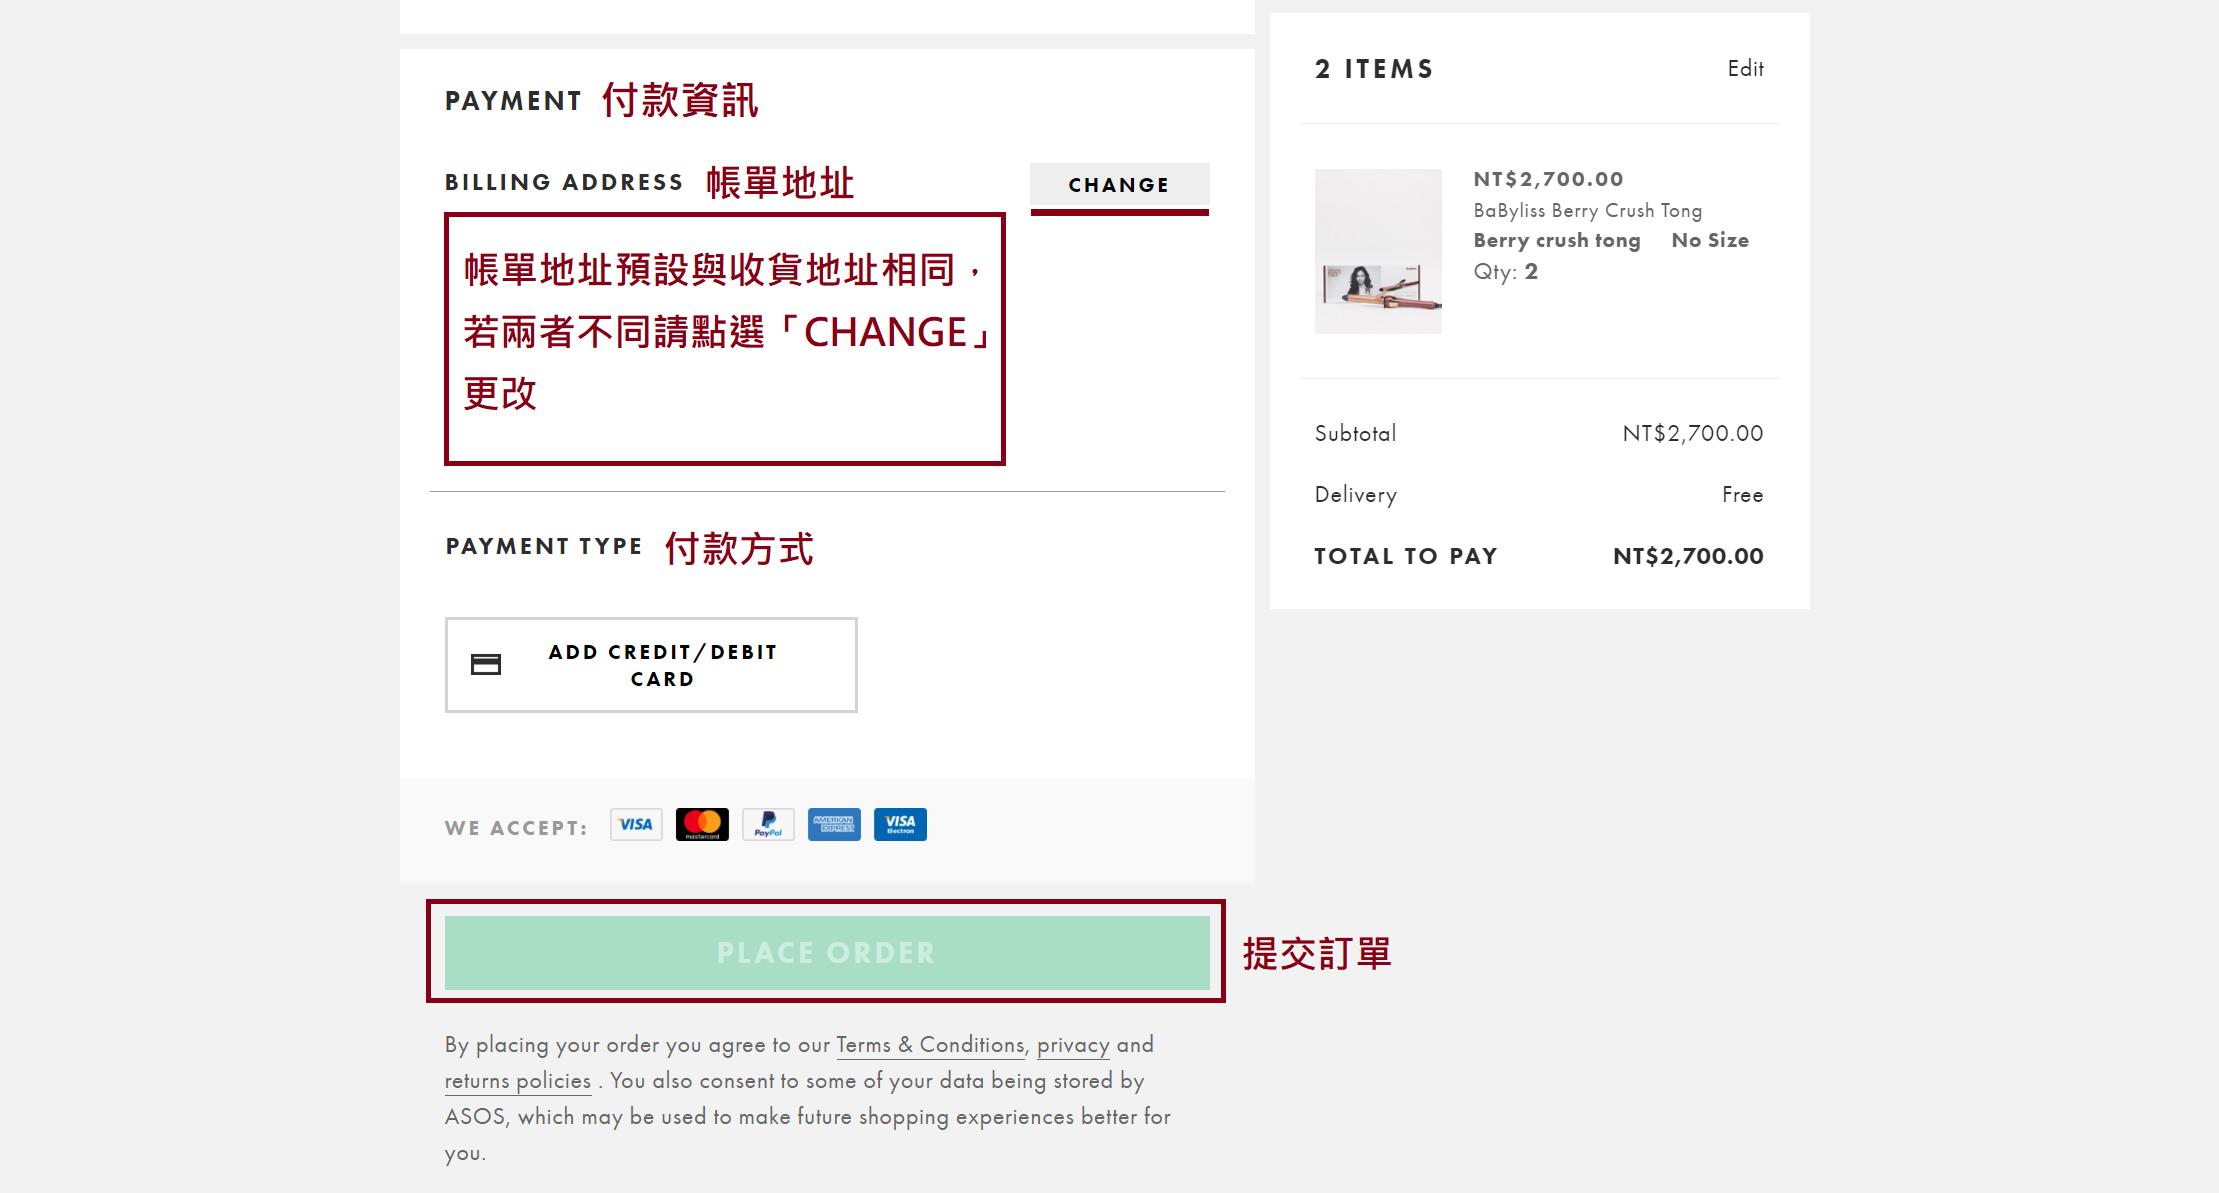 ASOS購物教學-填寫付款資訊(包括帳單地址)